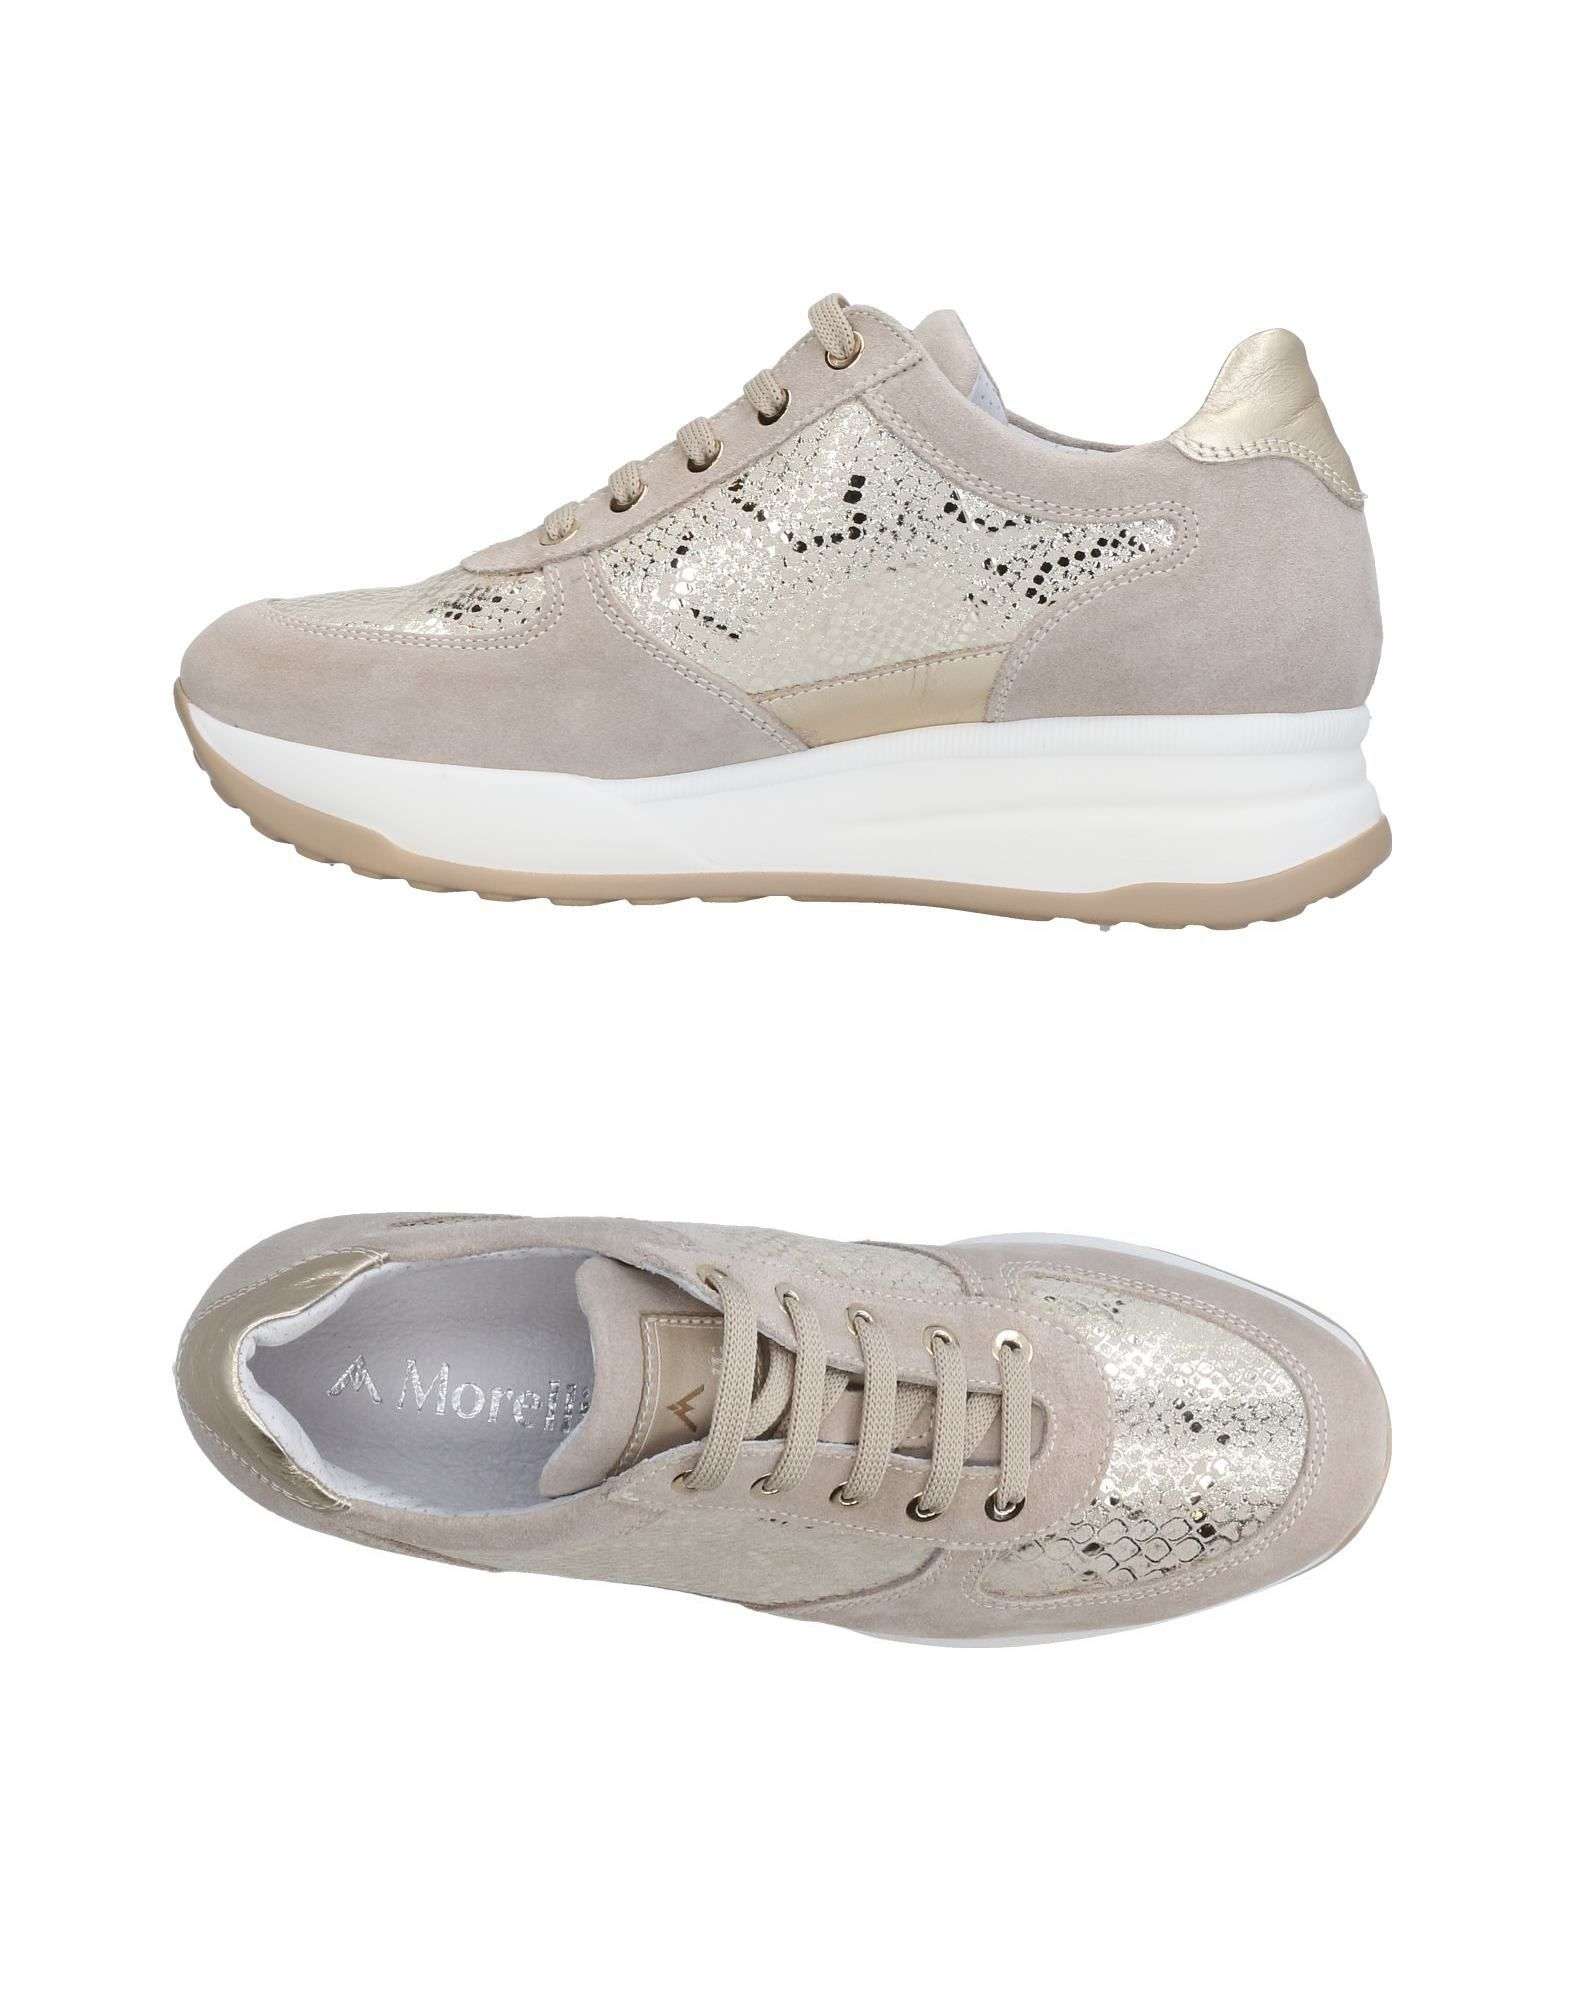 Andrea Morelli Sneakers Damen  11456882UO Gute Qualität beliebte Schuhe